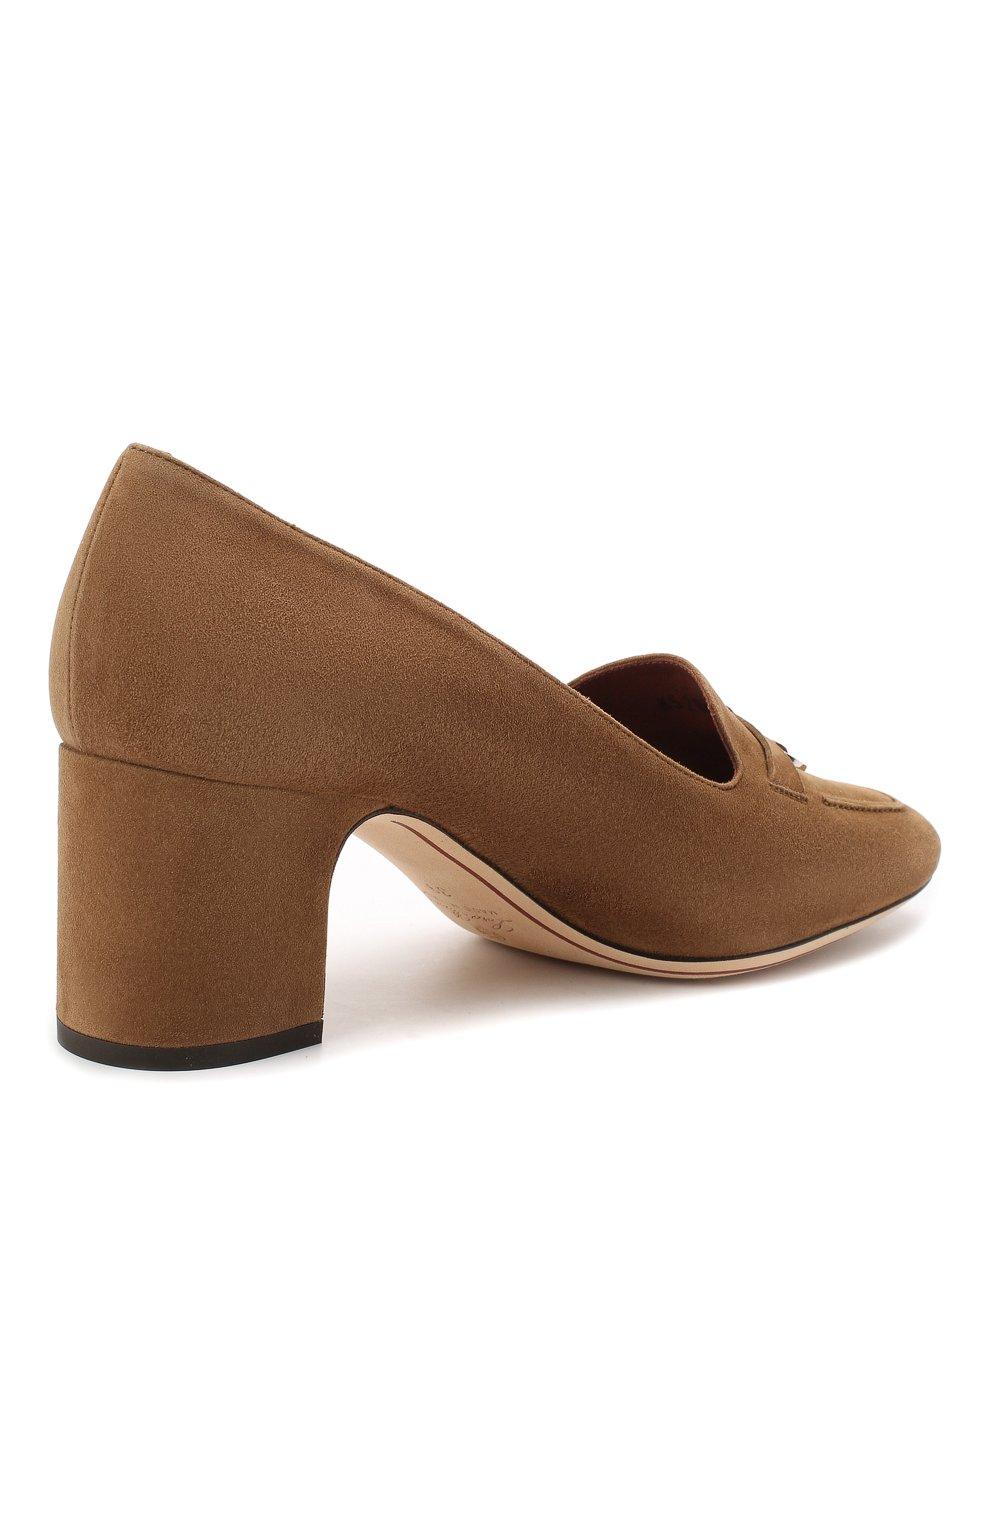 Женские замшевые туфли summer charms LORO PIANA коричневого цвета, арт. FAI7081 | Фото 4